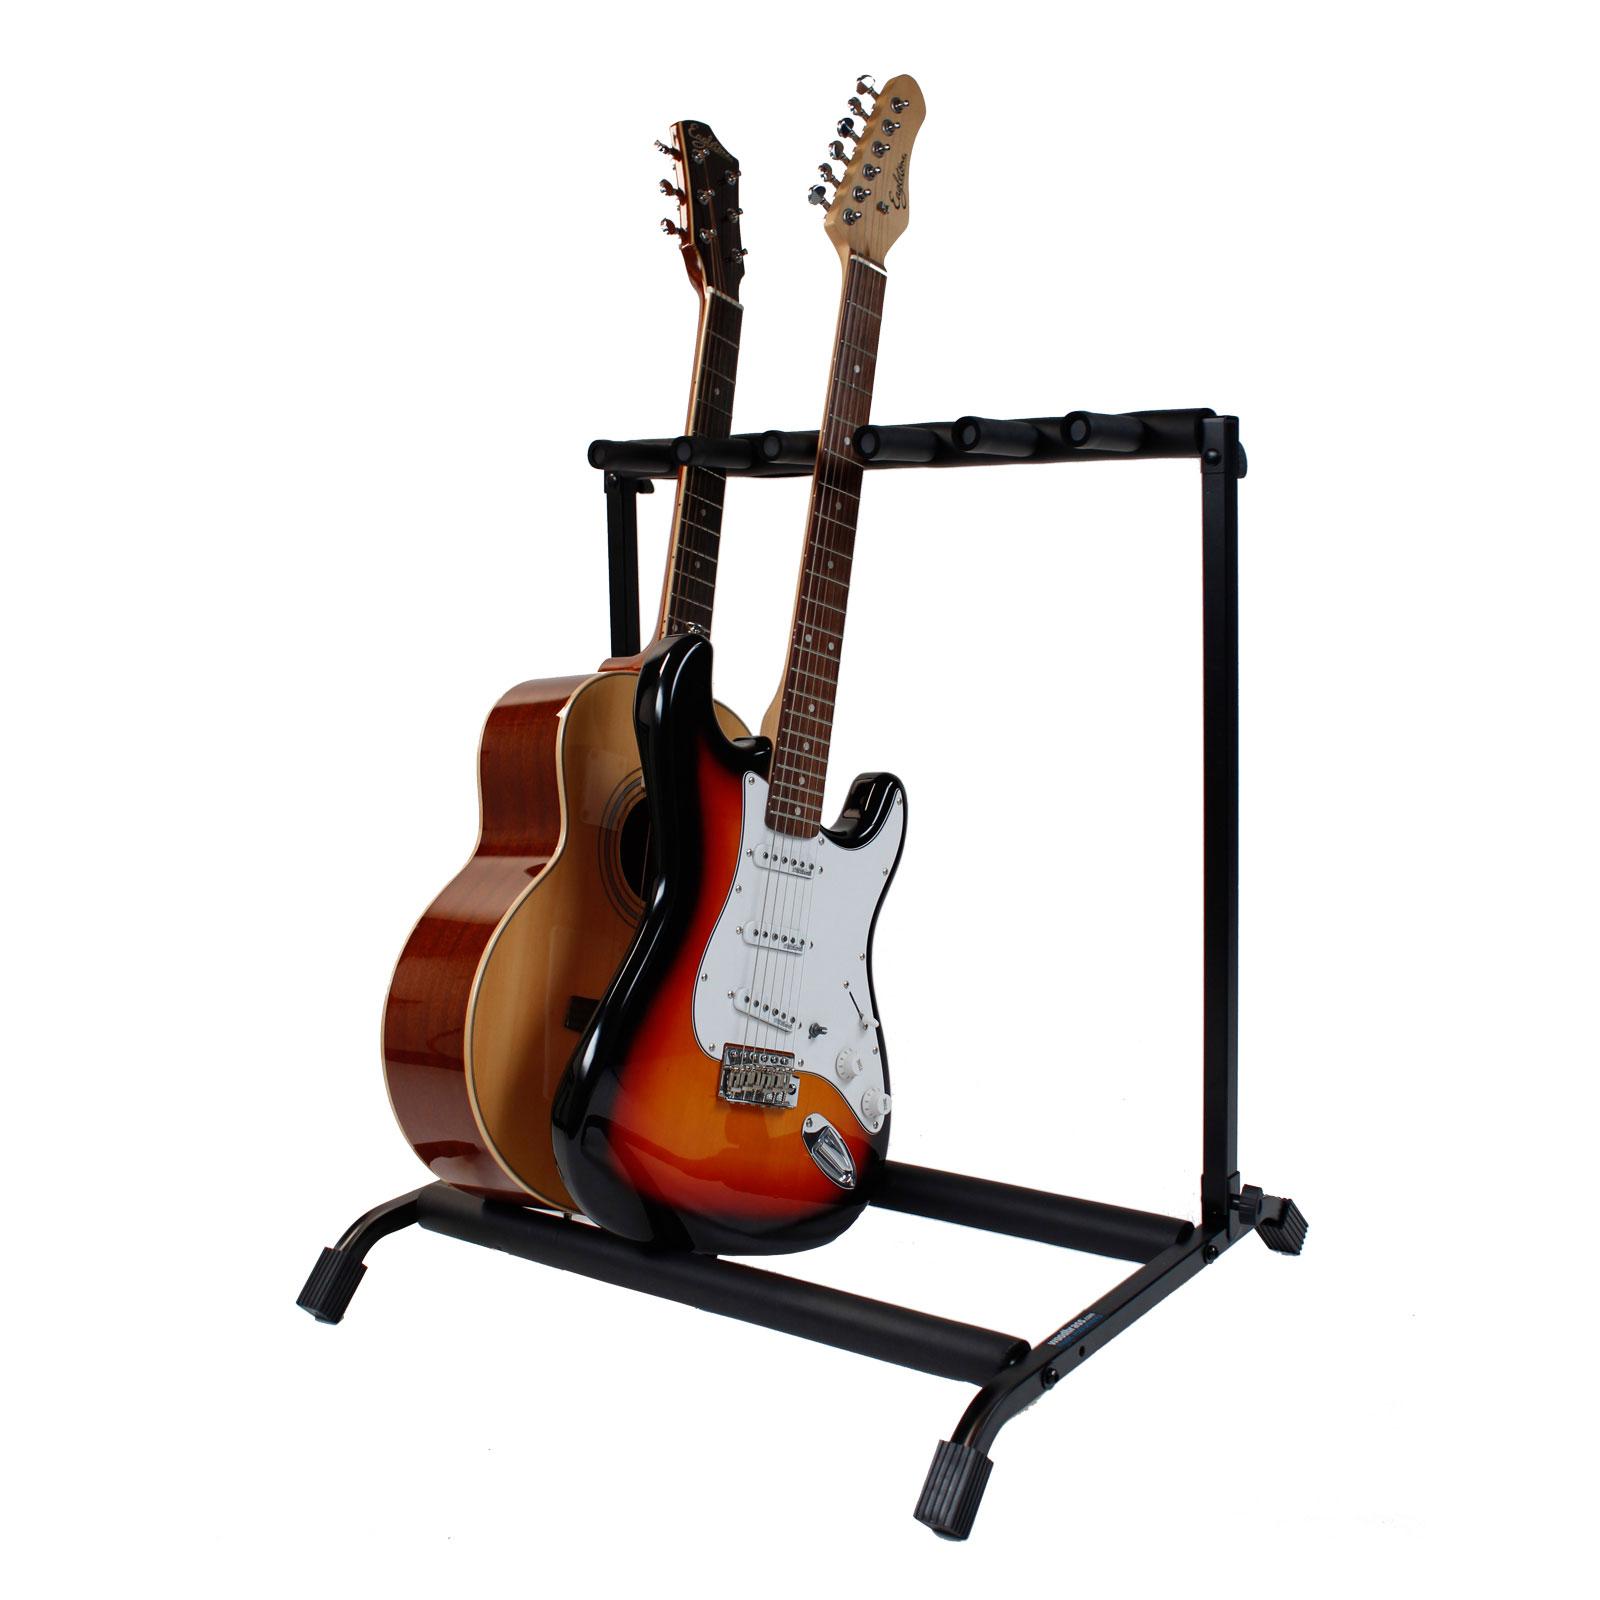 guitare stand achat vente de guitare pas cher. Black Bedroom Furniture Sets. Home Design Ideas